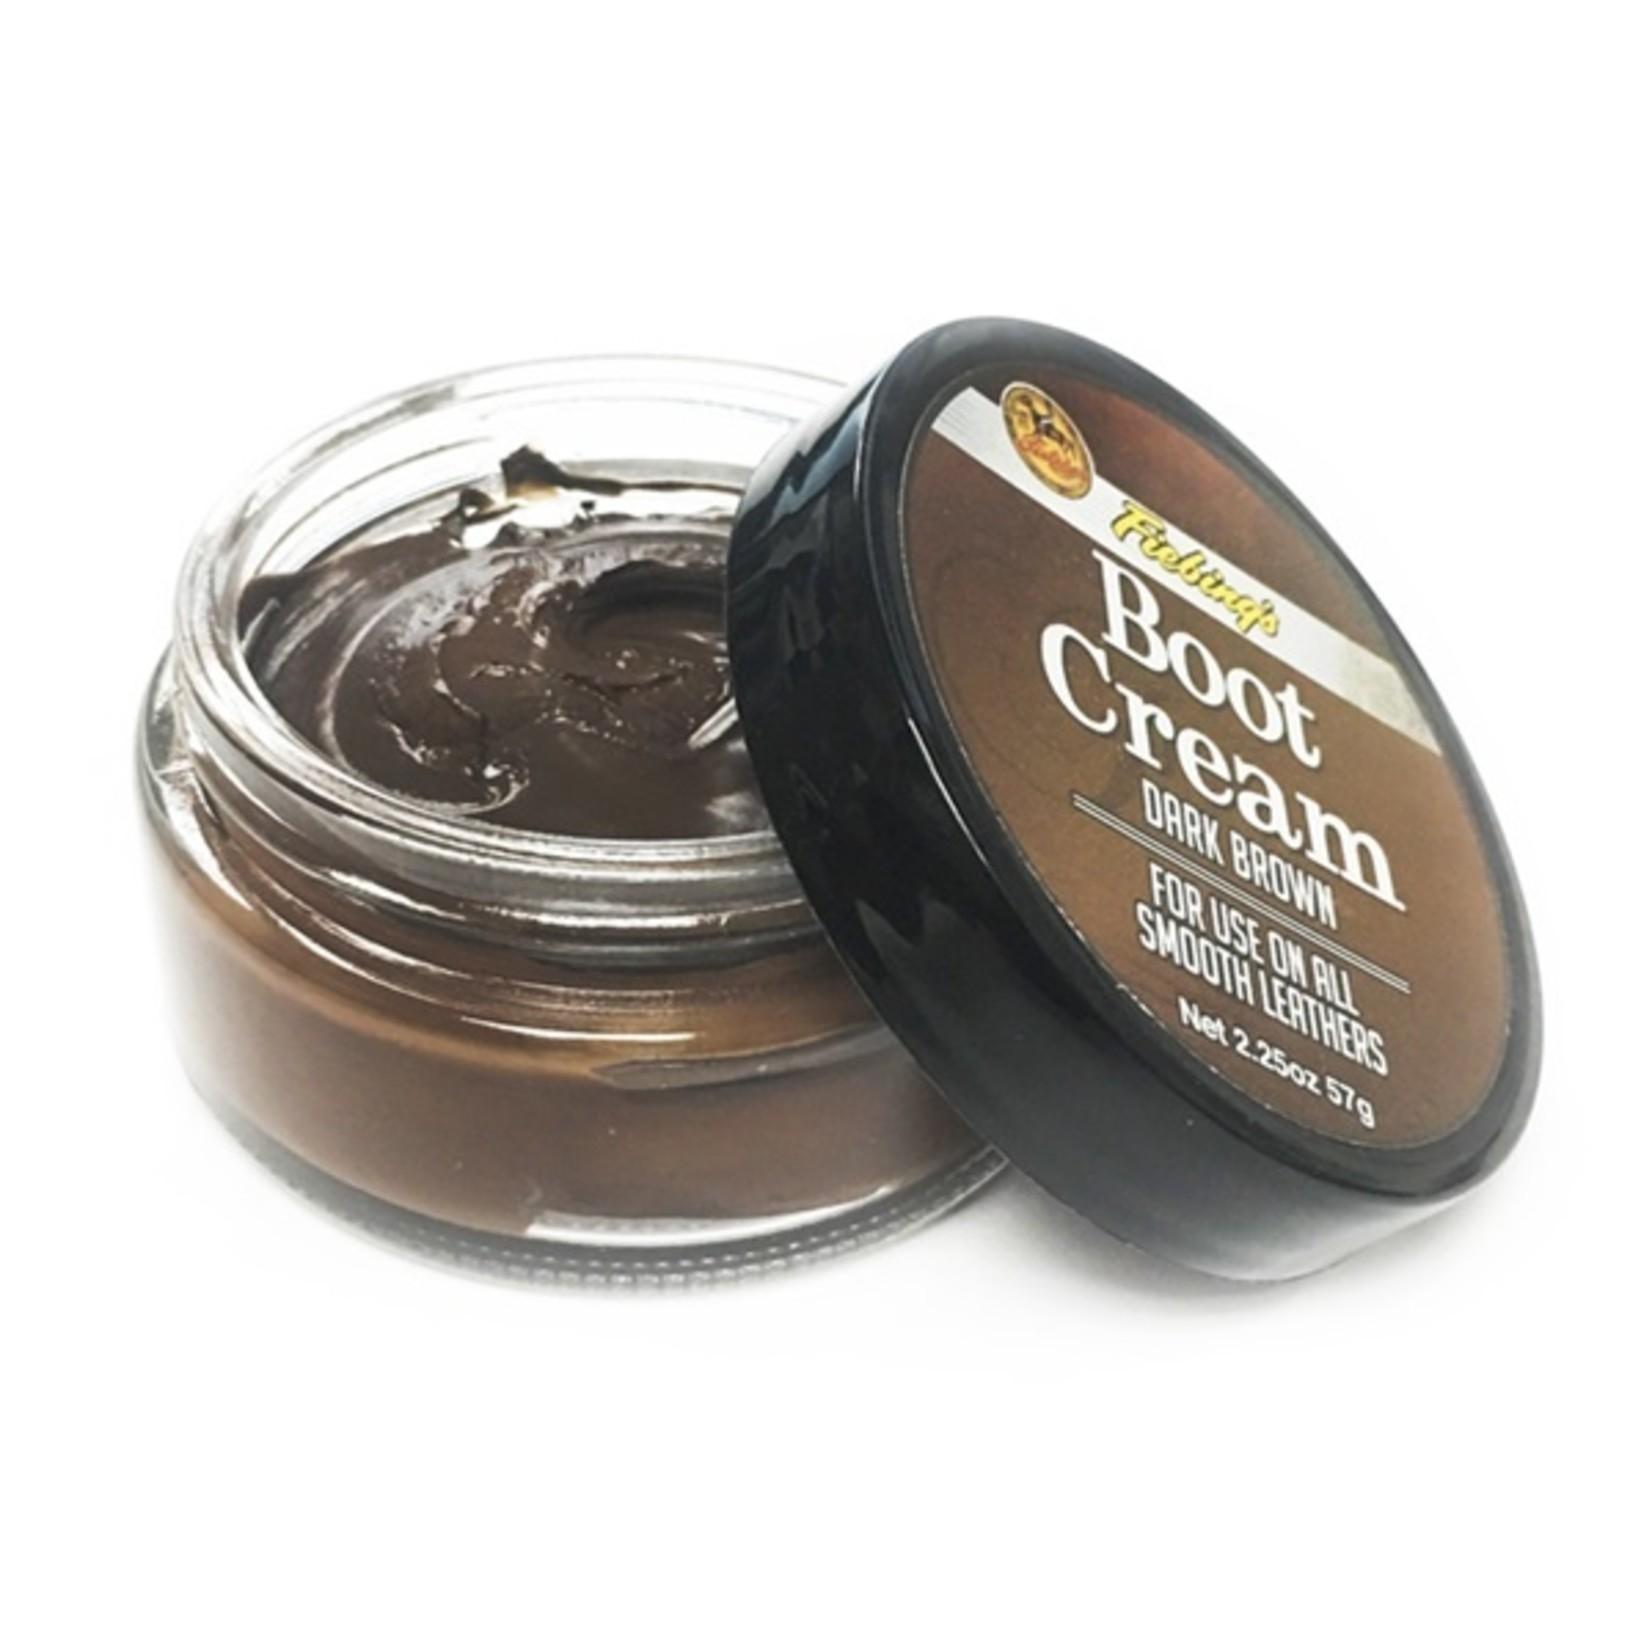 Boot Cream - Dark Brown